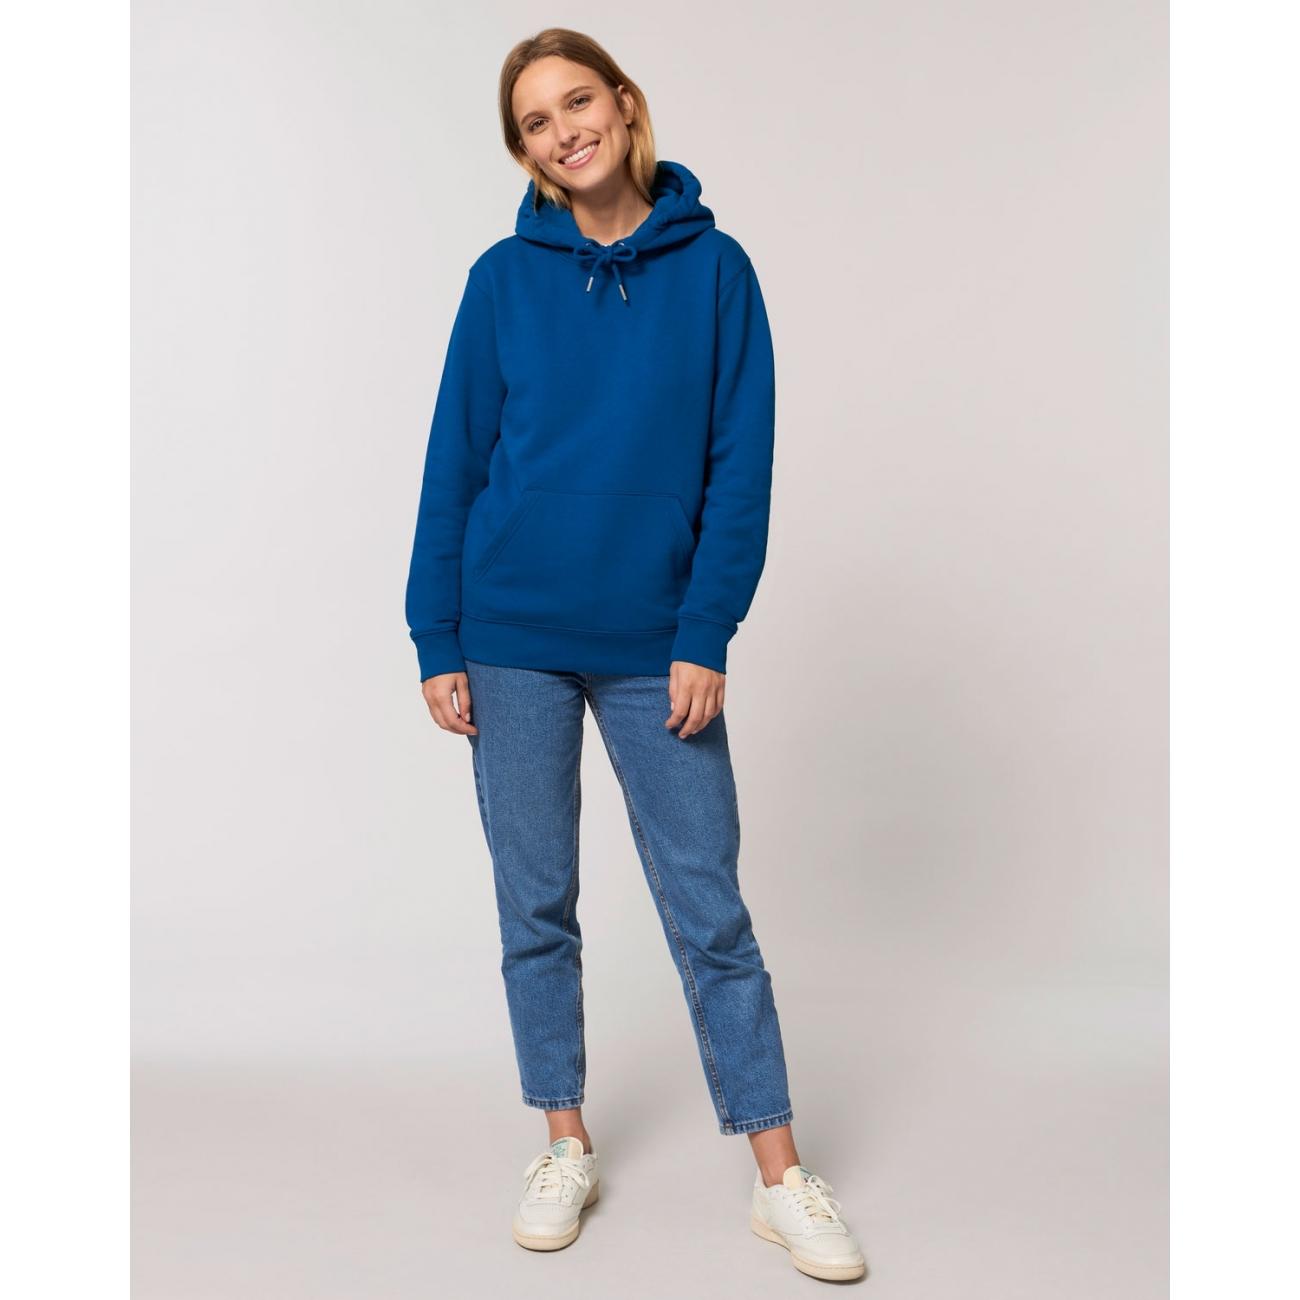 https://tee-shirt-bio.com/10109-thickbox_default/sweat-shirt-femme-capuche-epais-et-interieur-doux-coton-bio-bleu-roy.jpg